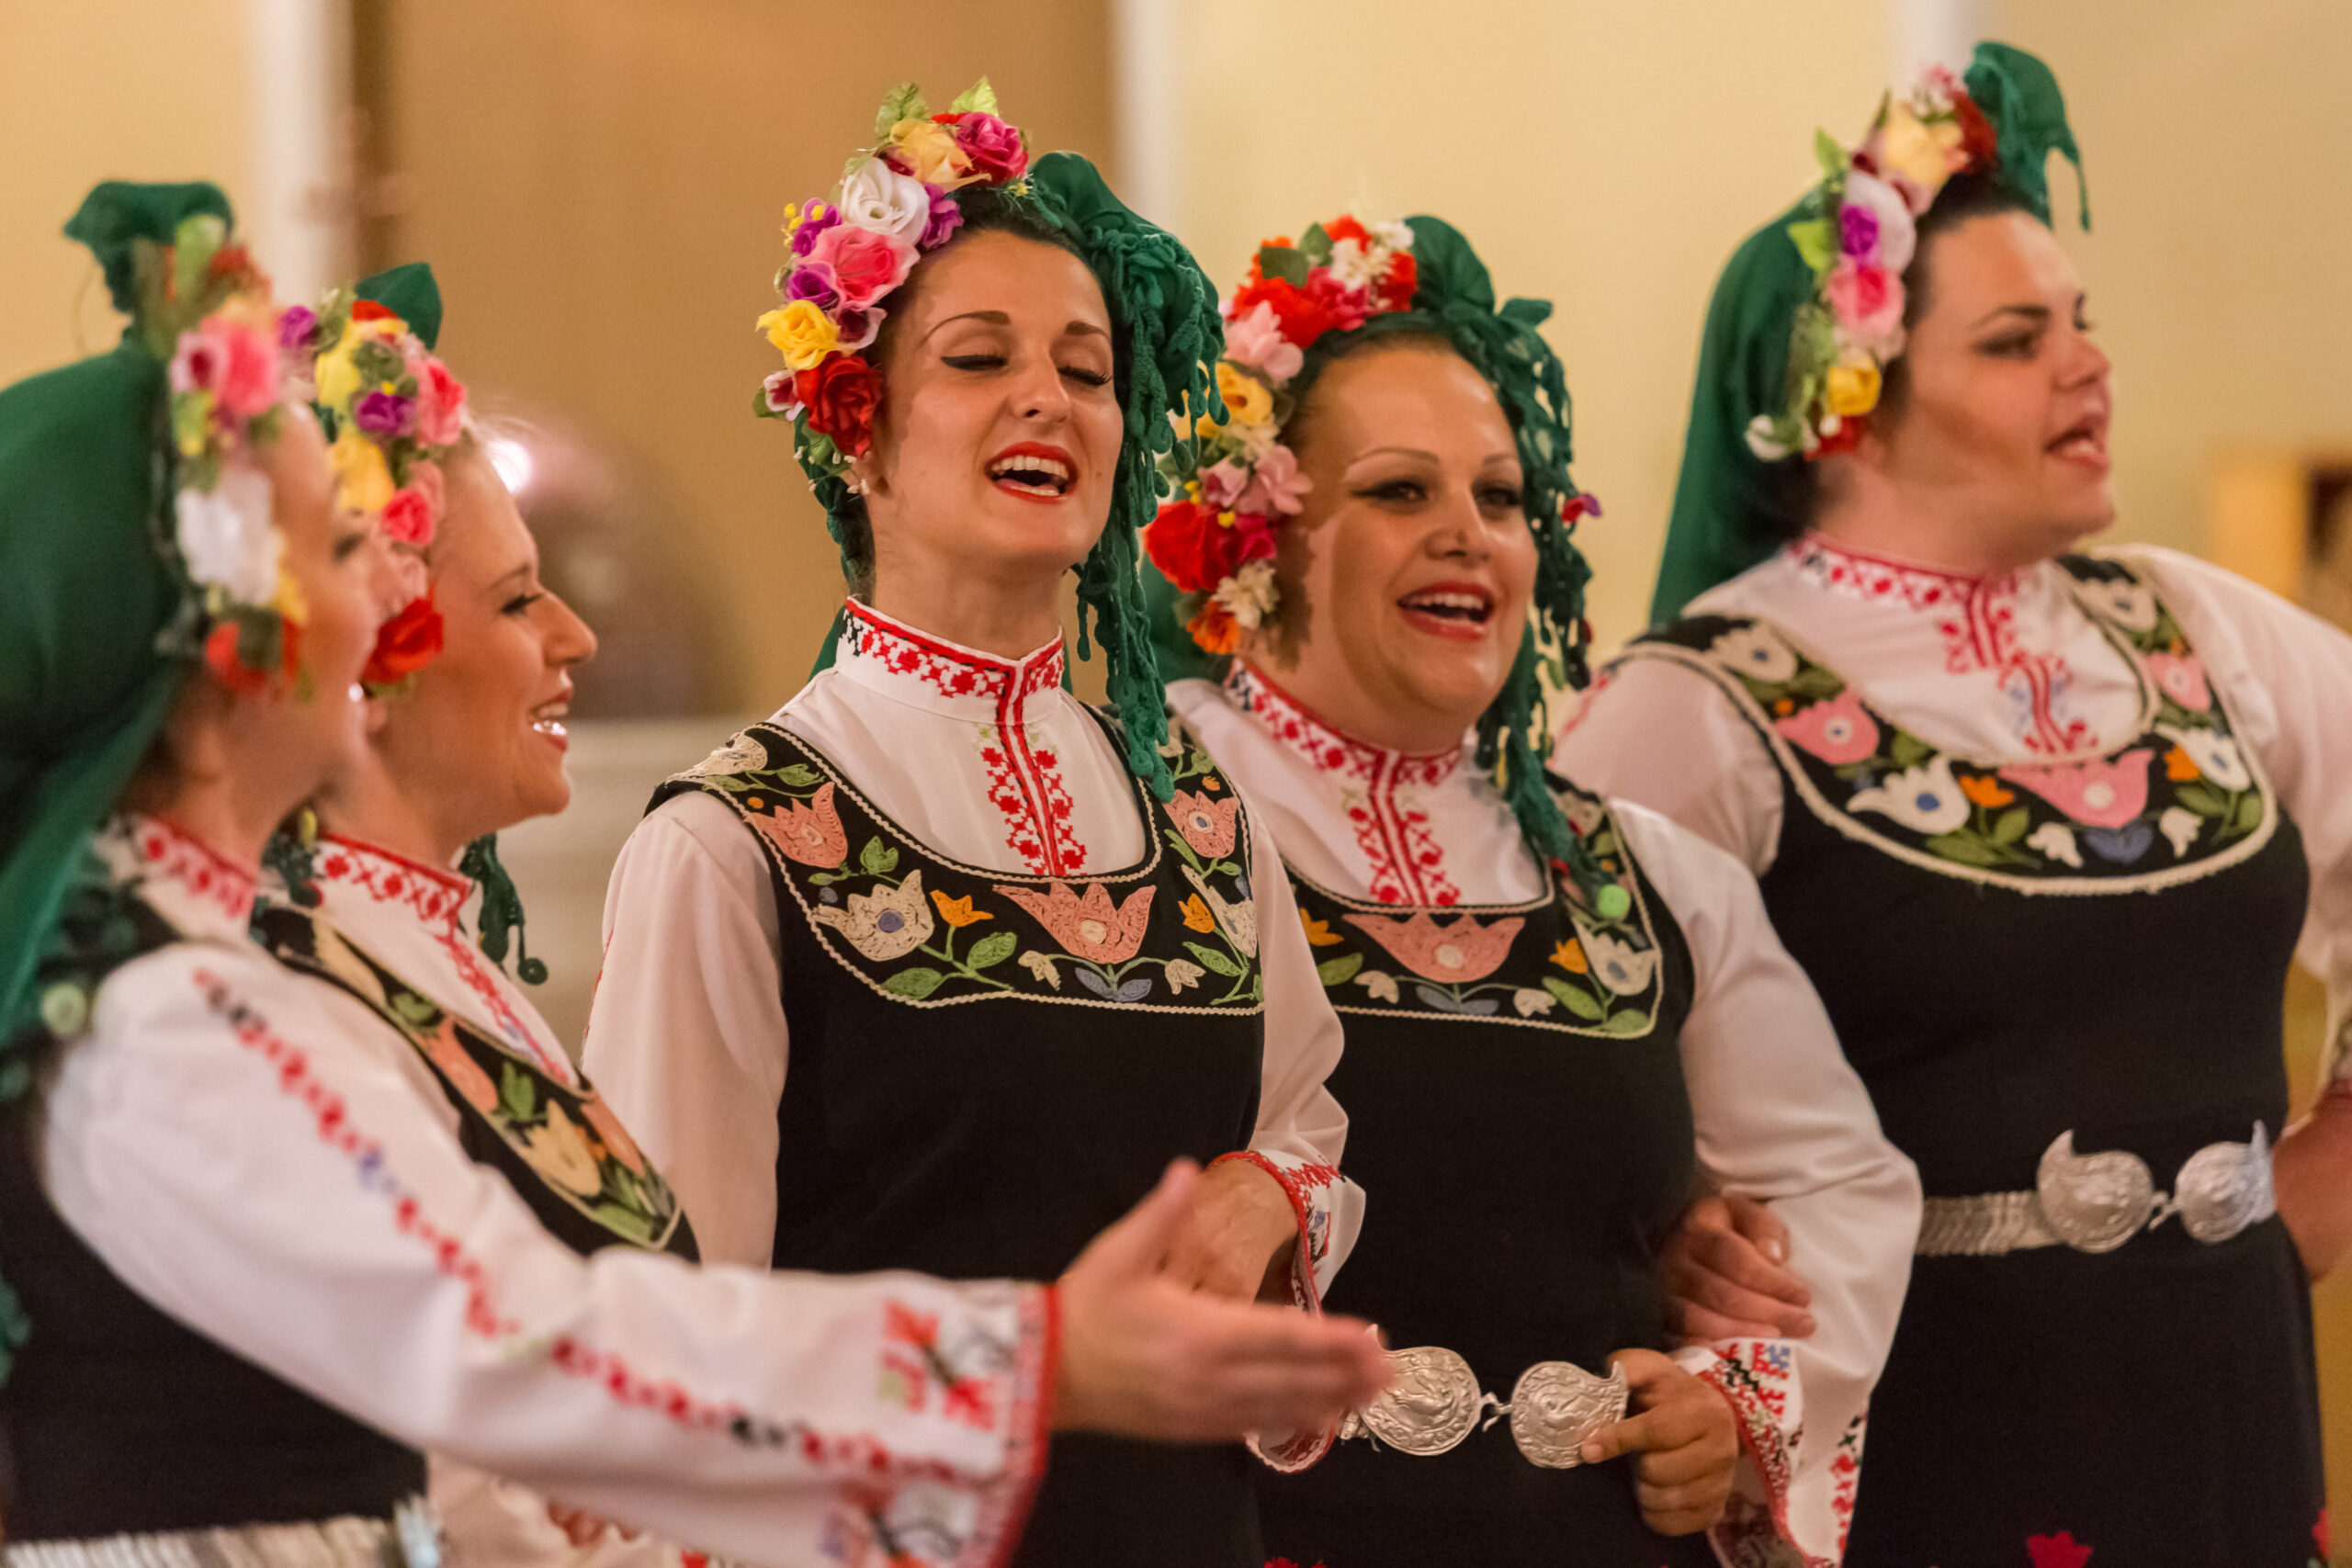 Márton Rónási, Madžarska/Hungary: Hungarian Ladies, 2015